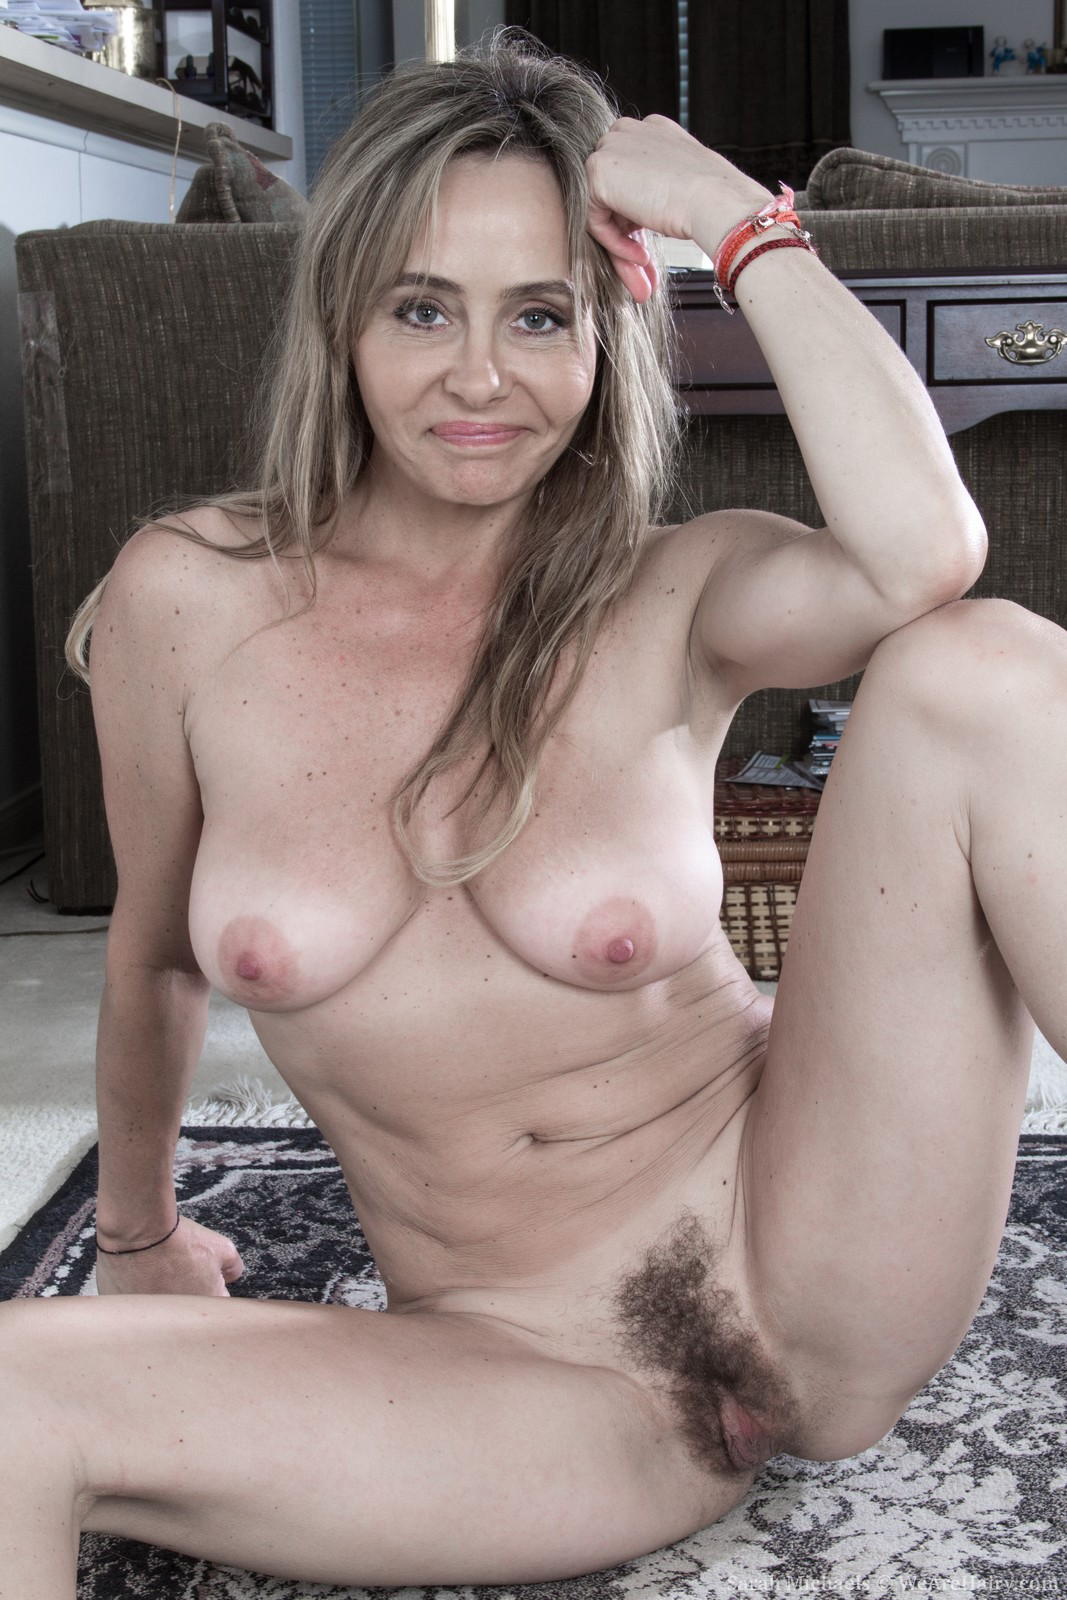 Nude milf gallery